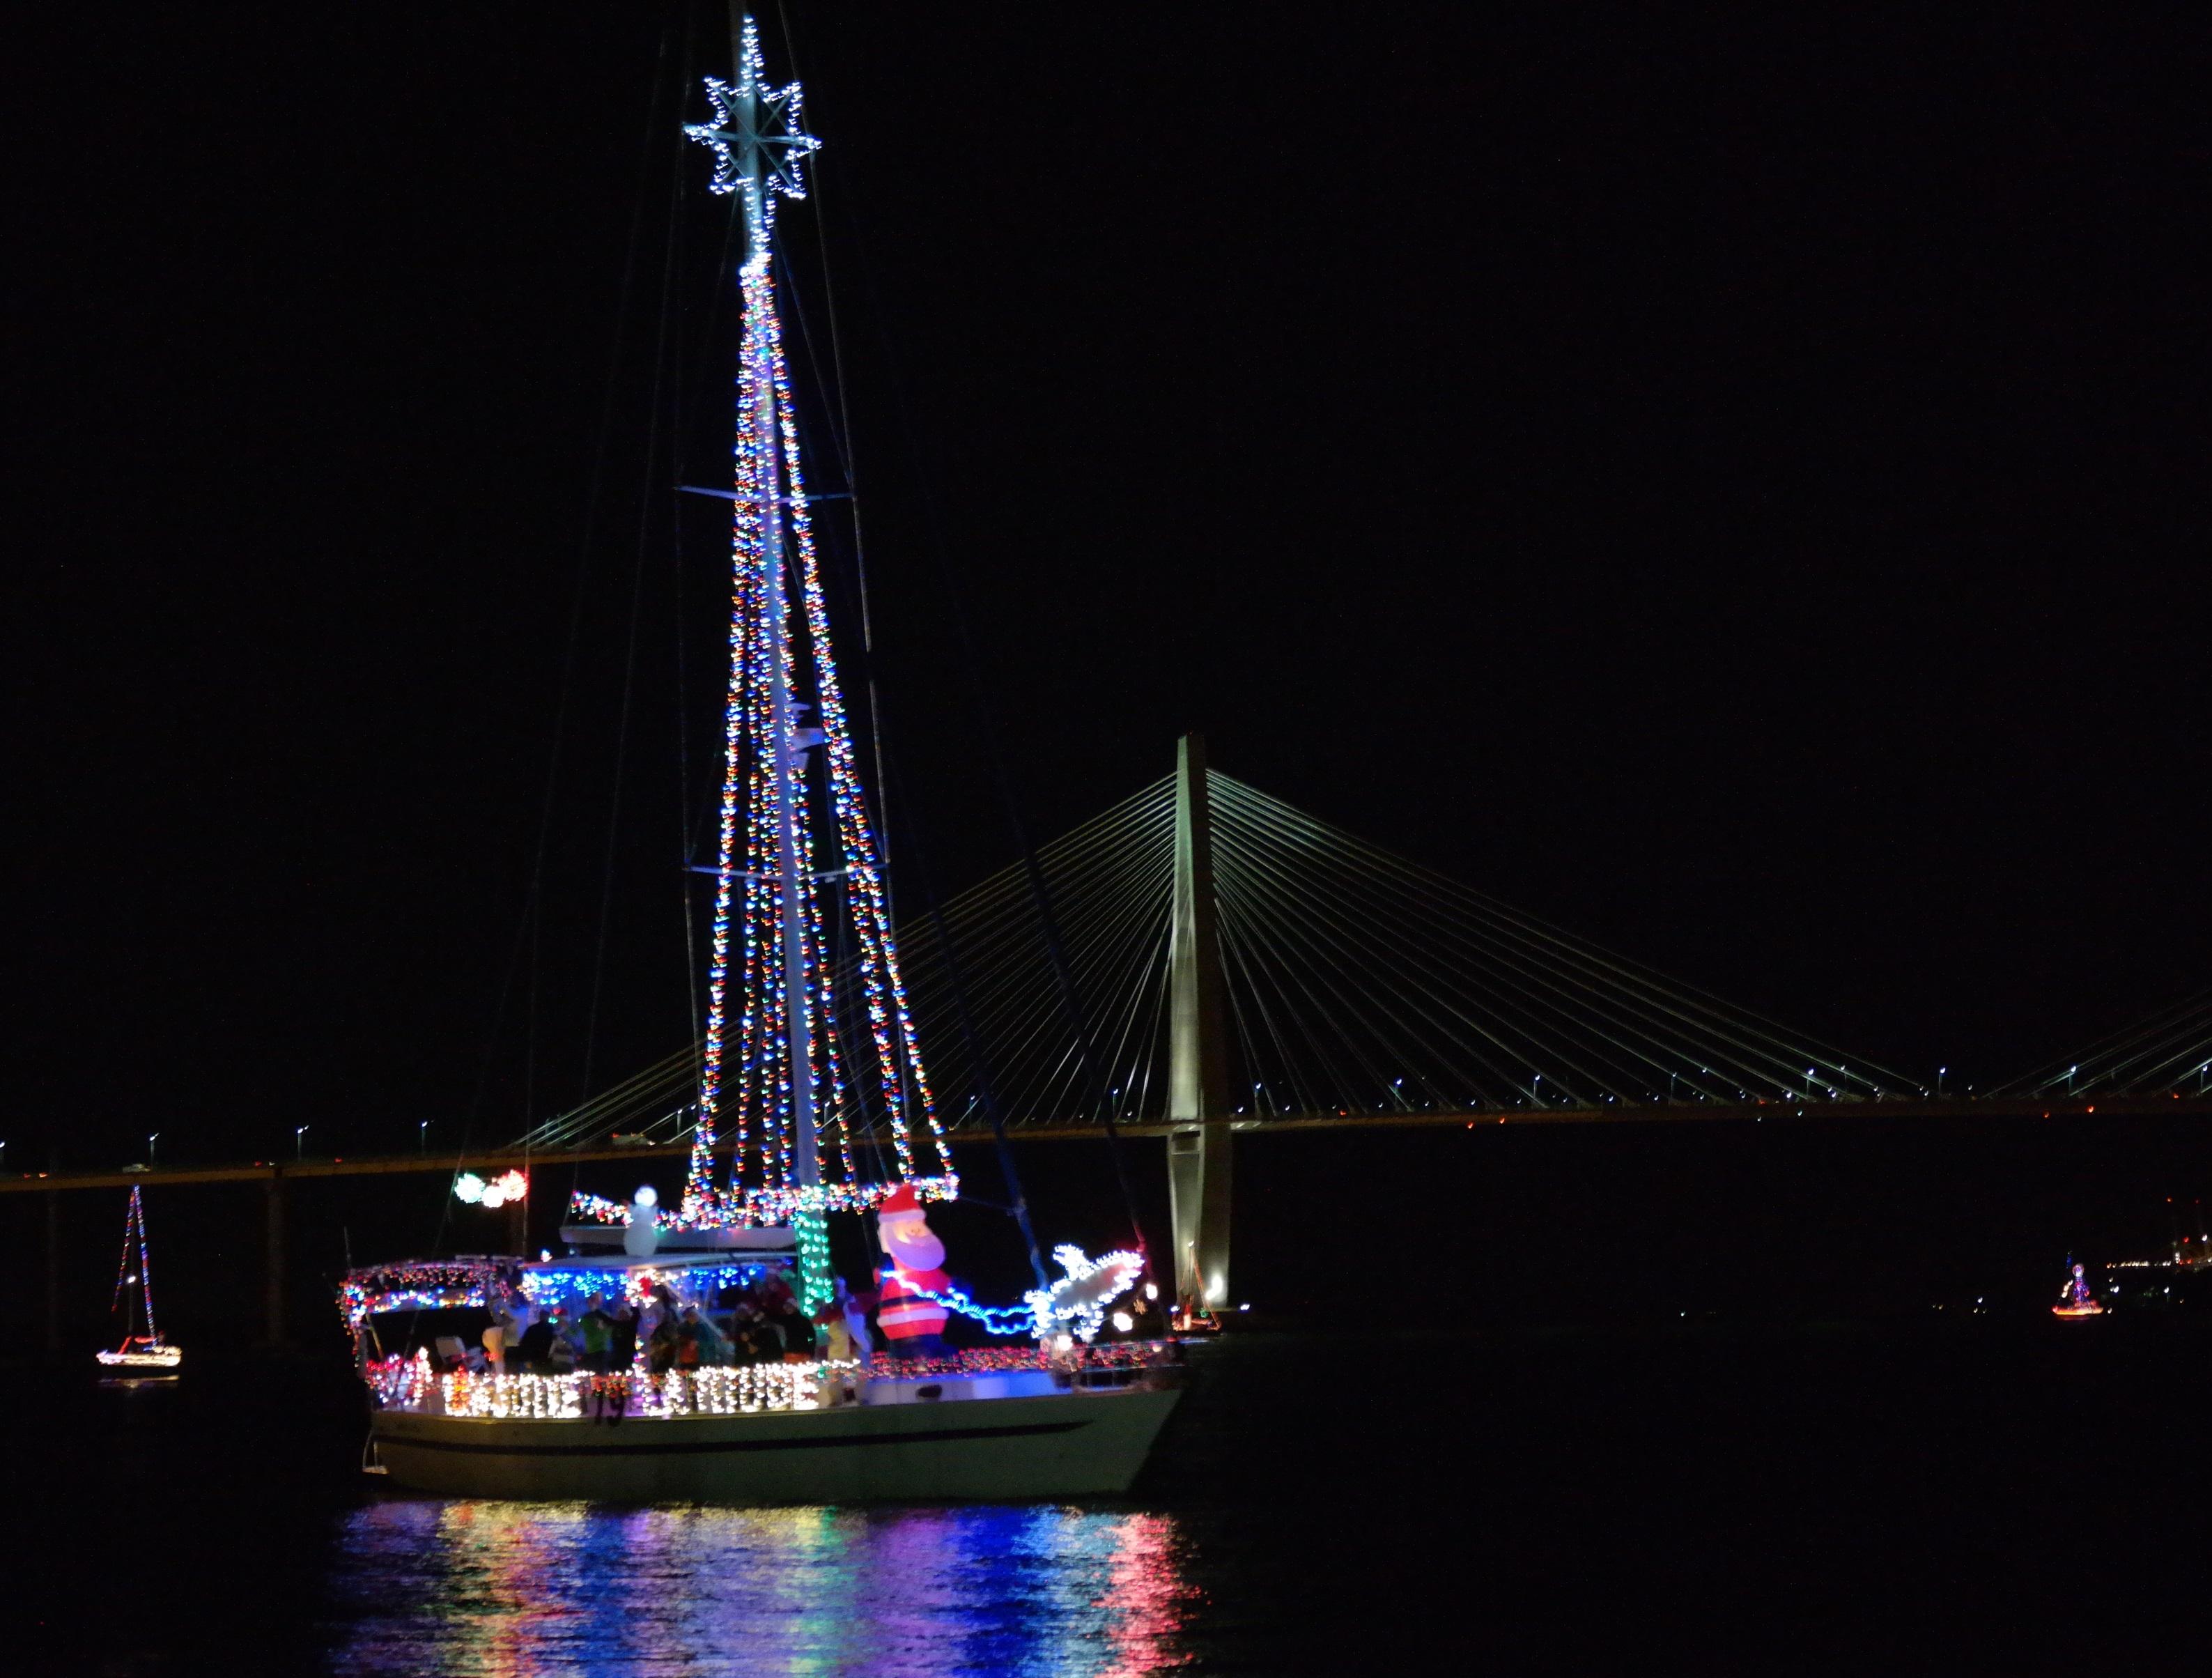 Charleston Christmas Parade 2020 Holiday Parade of Boats | Charleston's premiere on the water